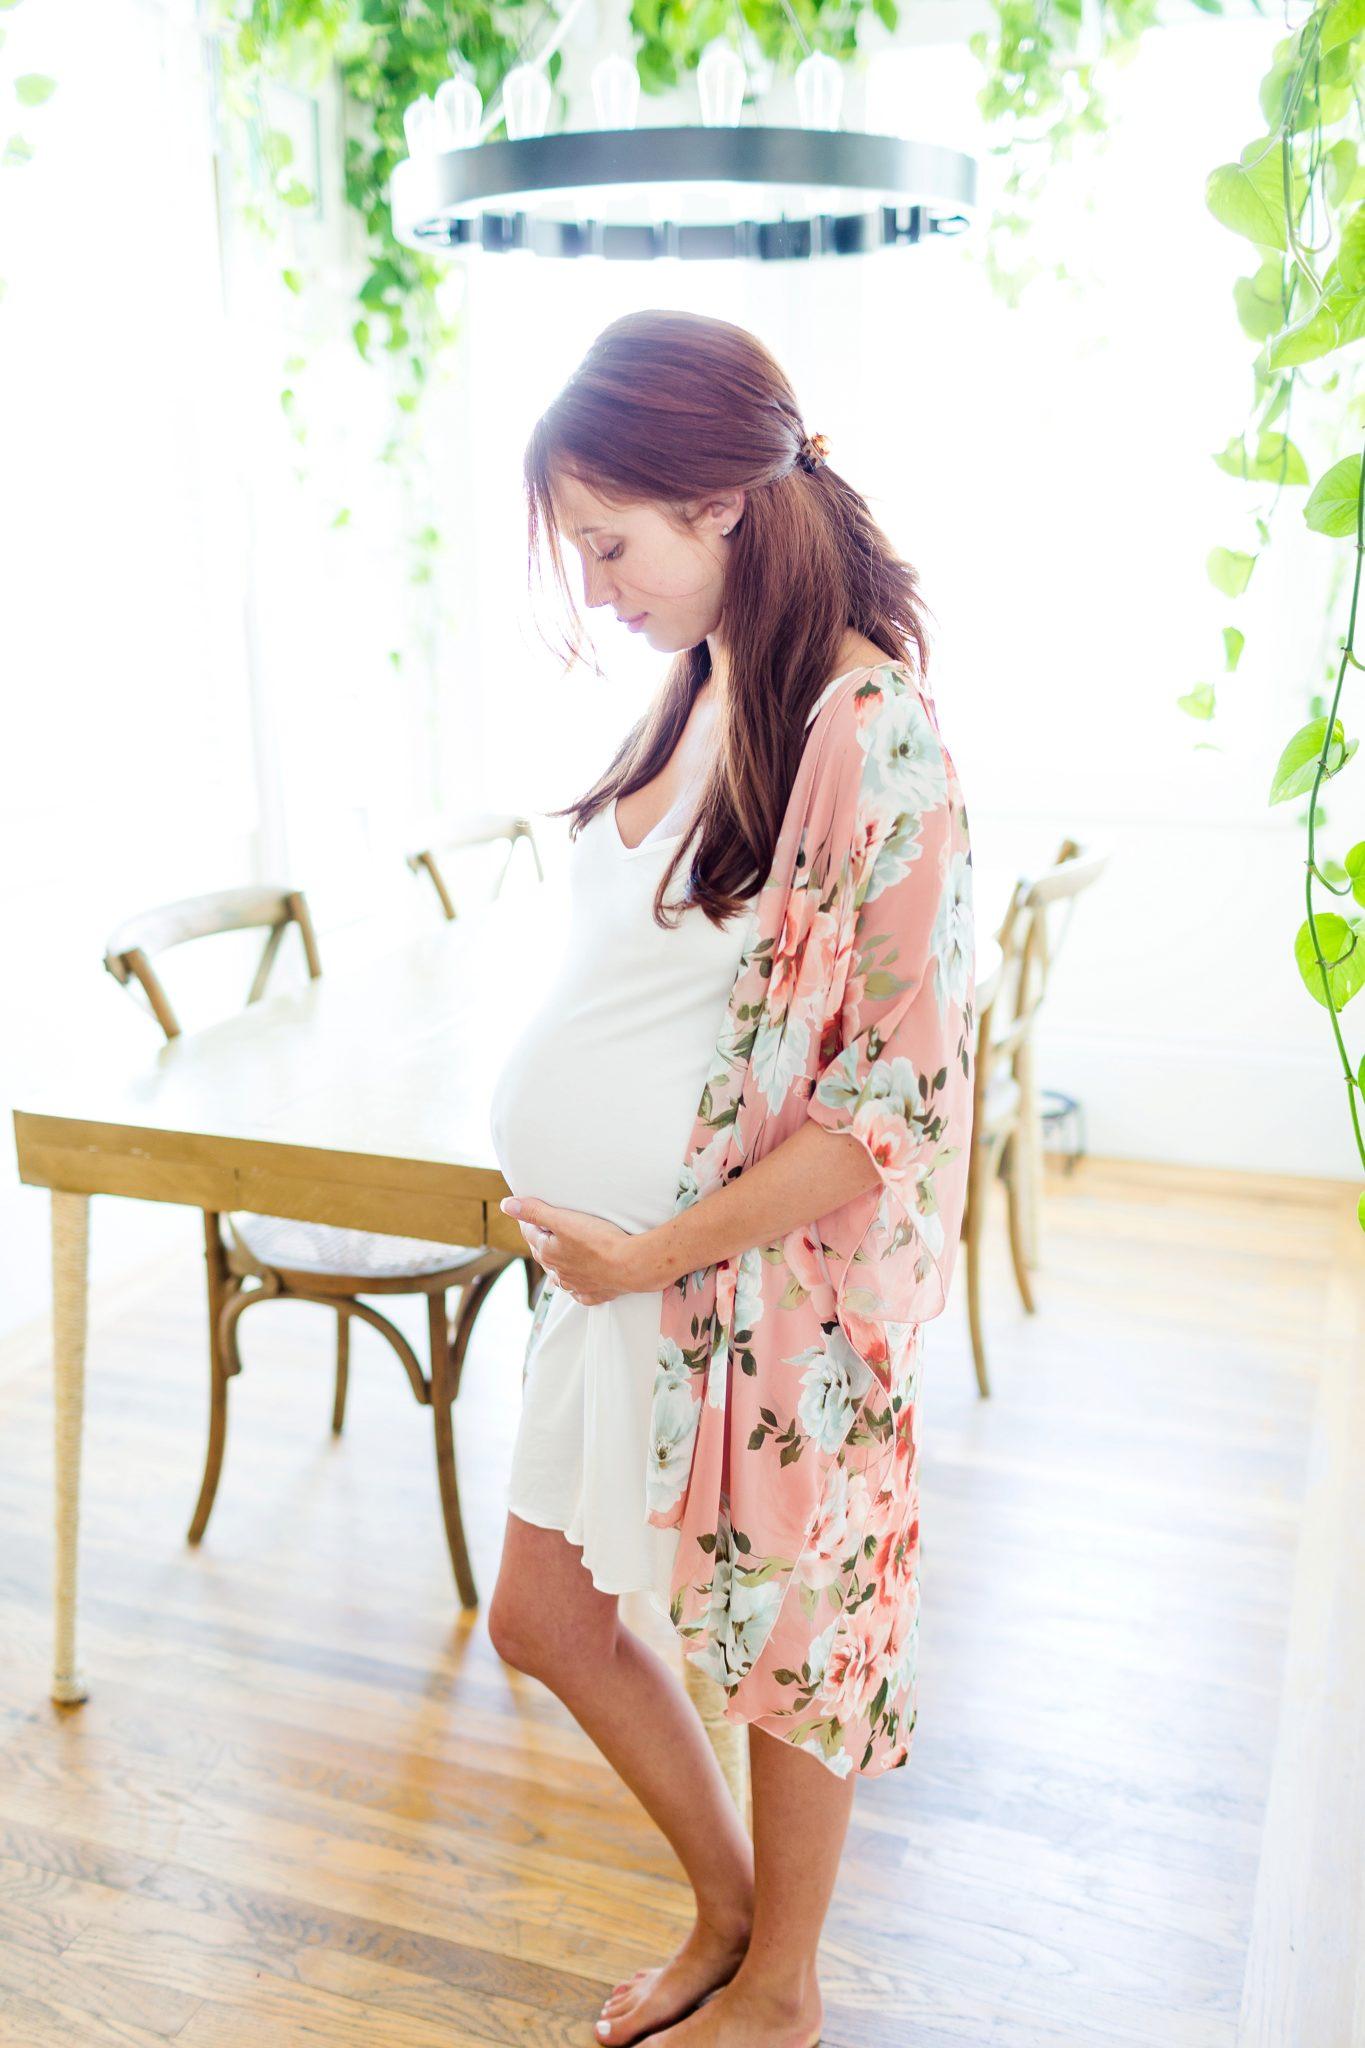 kyla_maternity_gallery_5